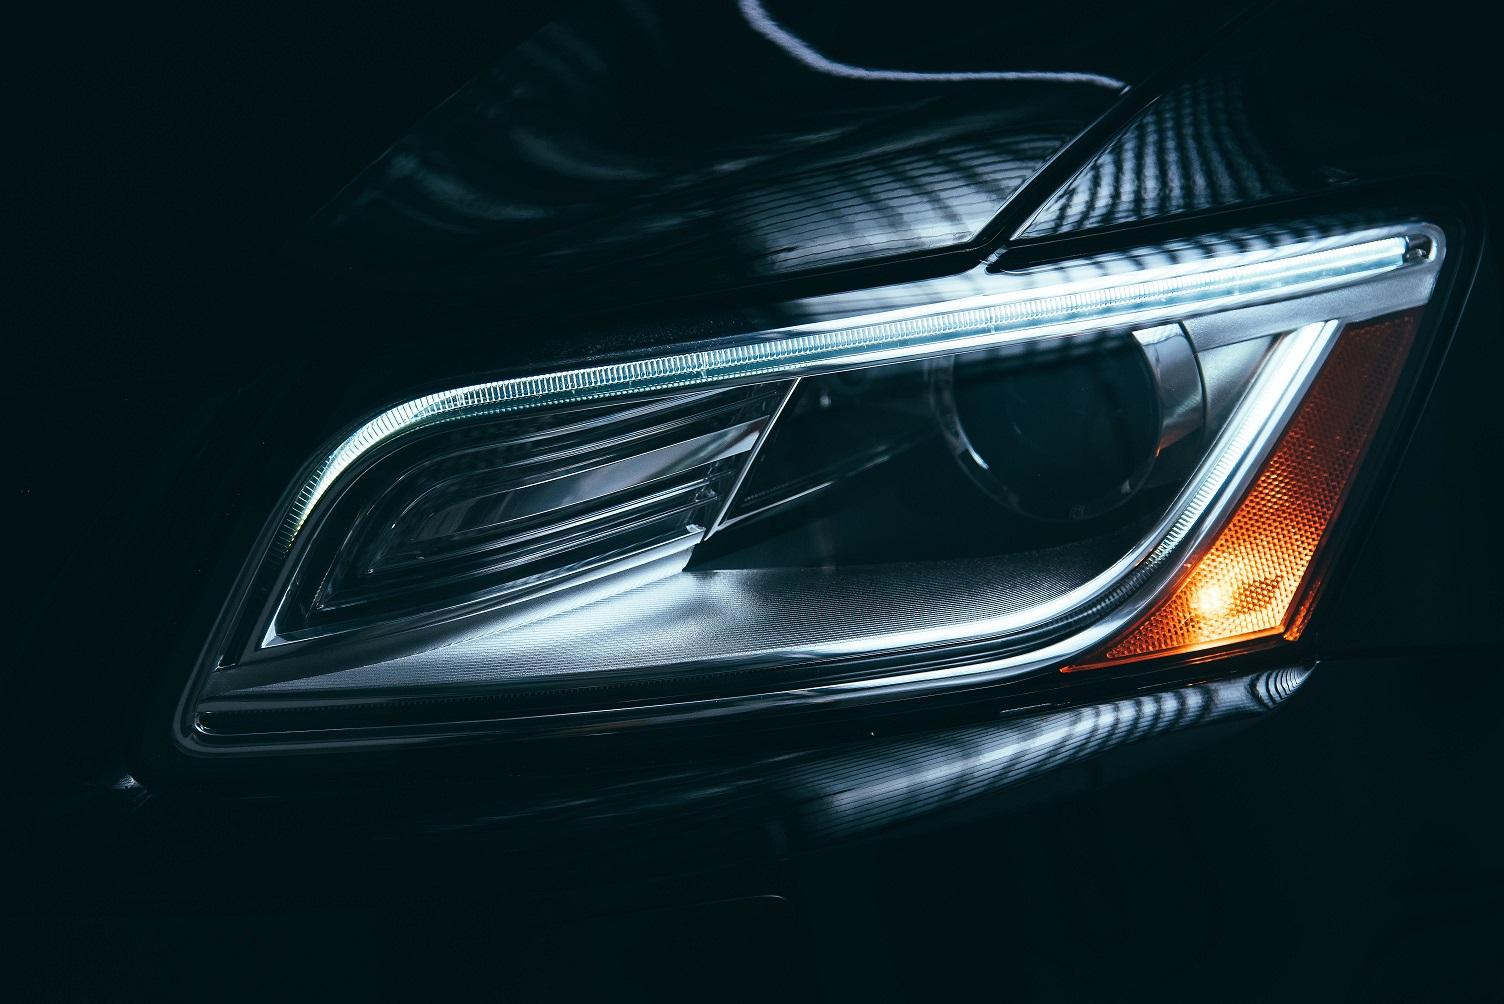 An extreme closeup of the acute angle of a headlight.